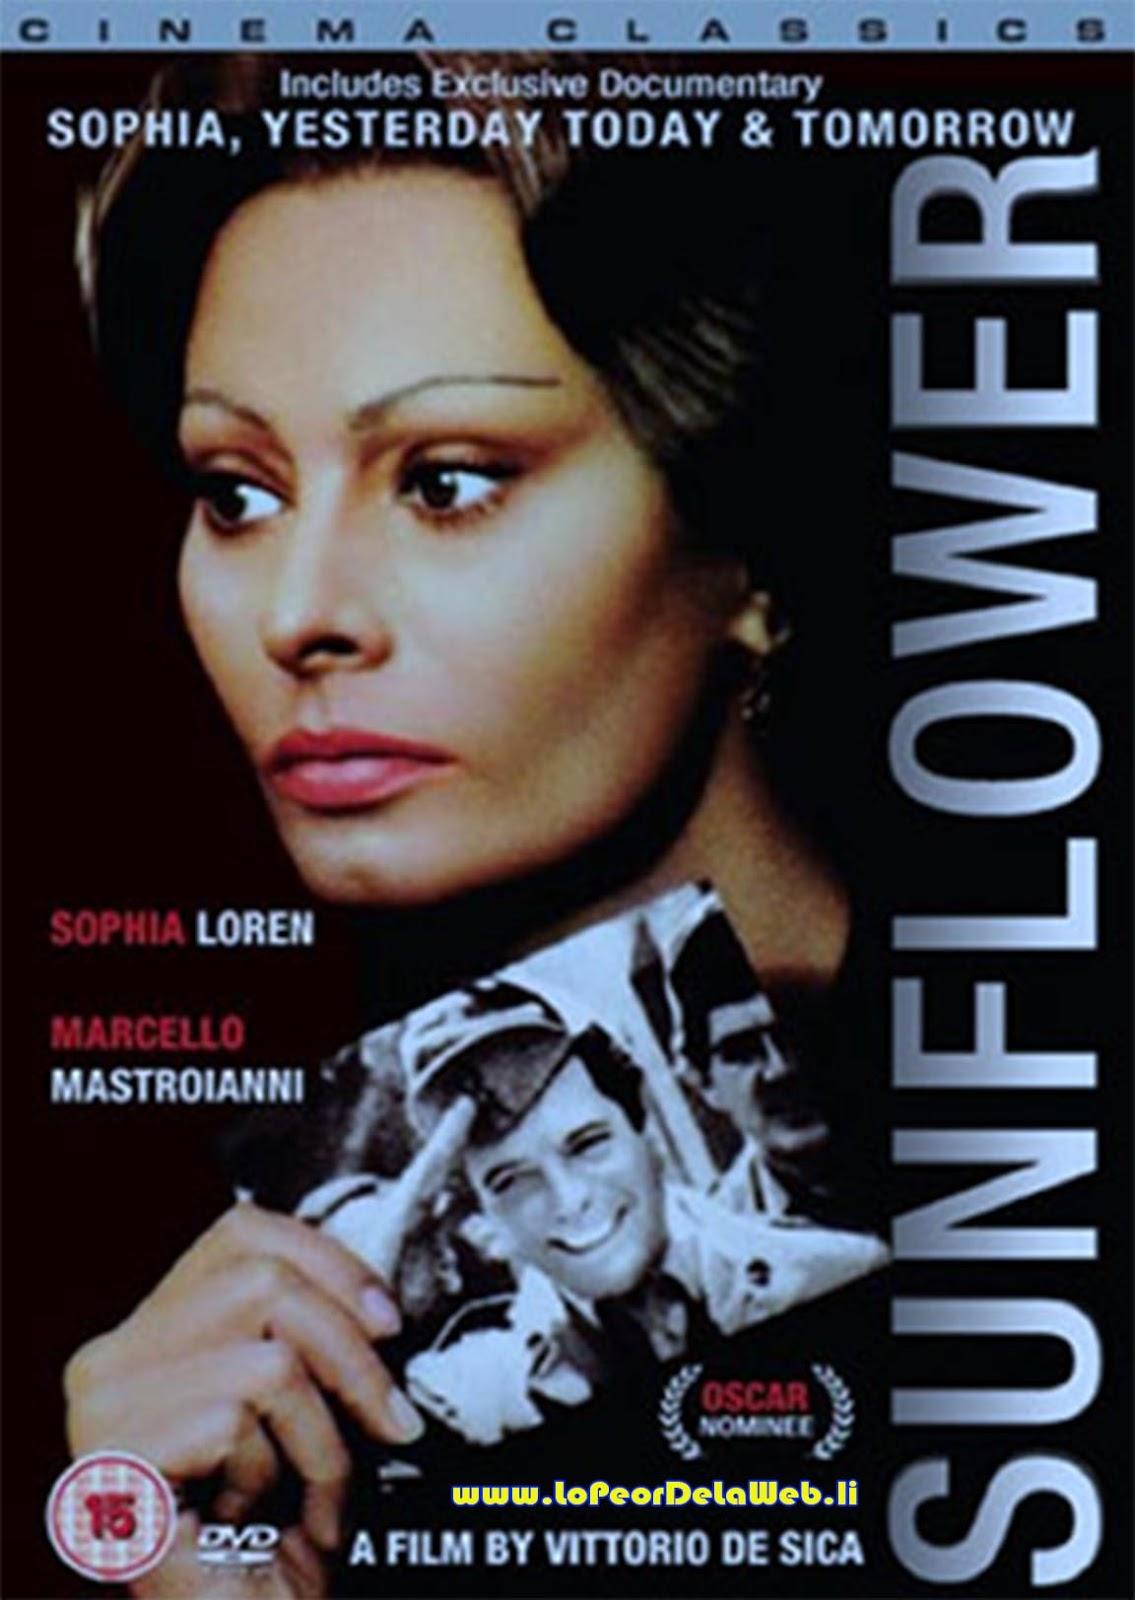 Los Girasoles de Rusia (1970 / Sophia Loren/M. Mastroianni)